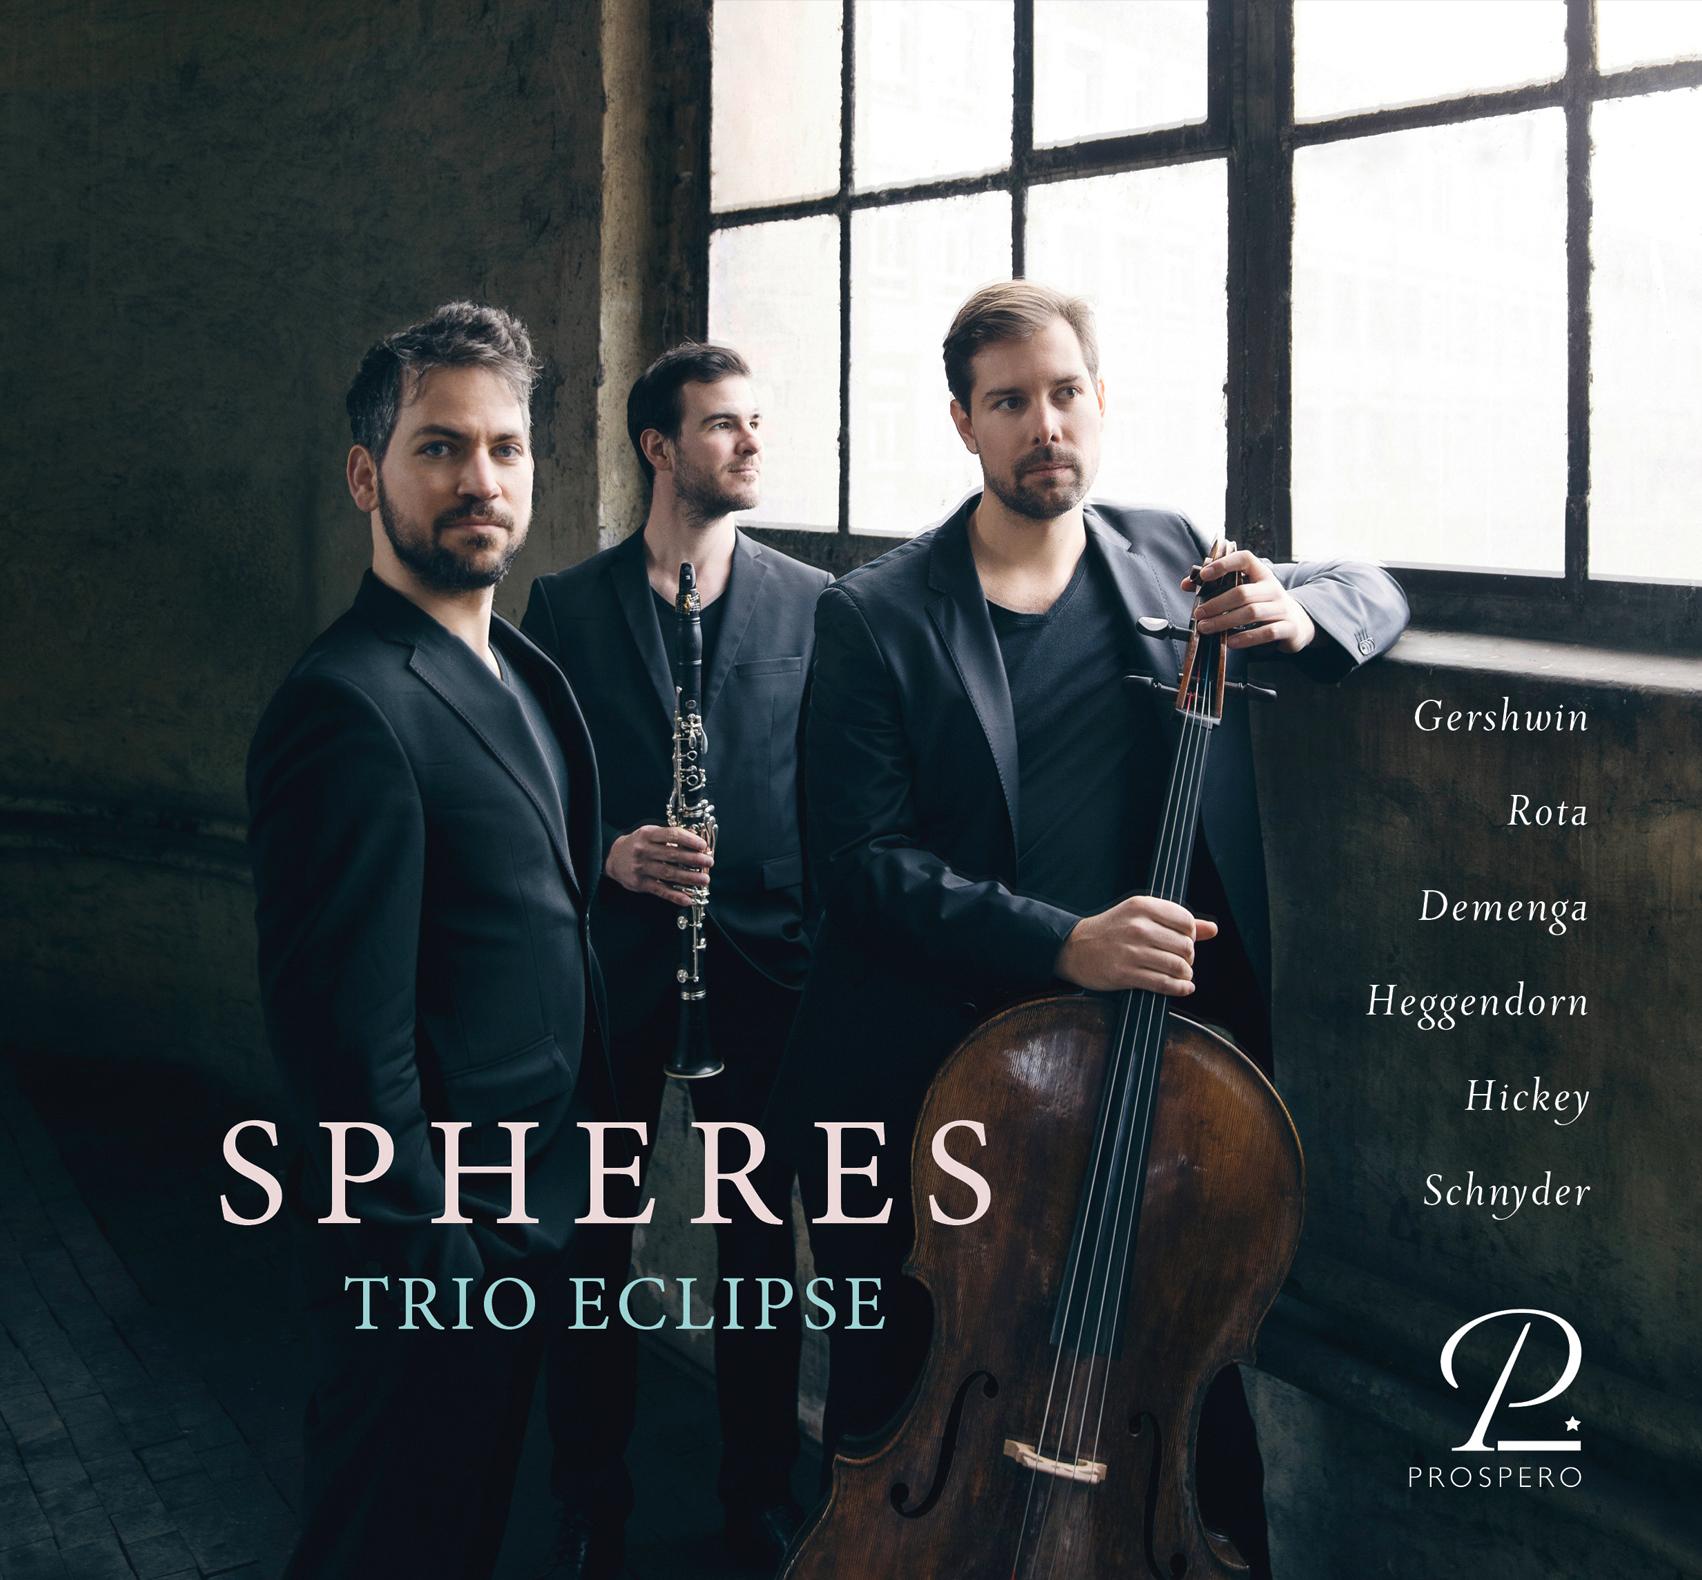 Trio Eclipse: Spheres - Cover 2D